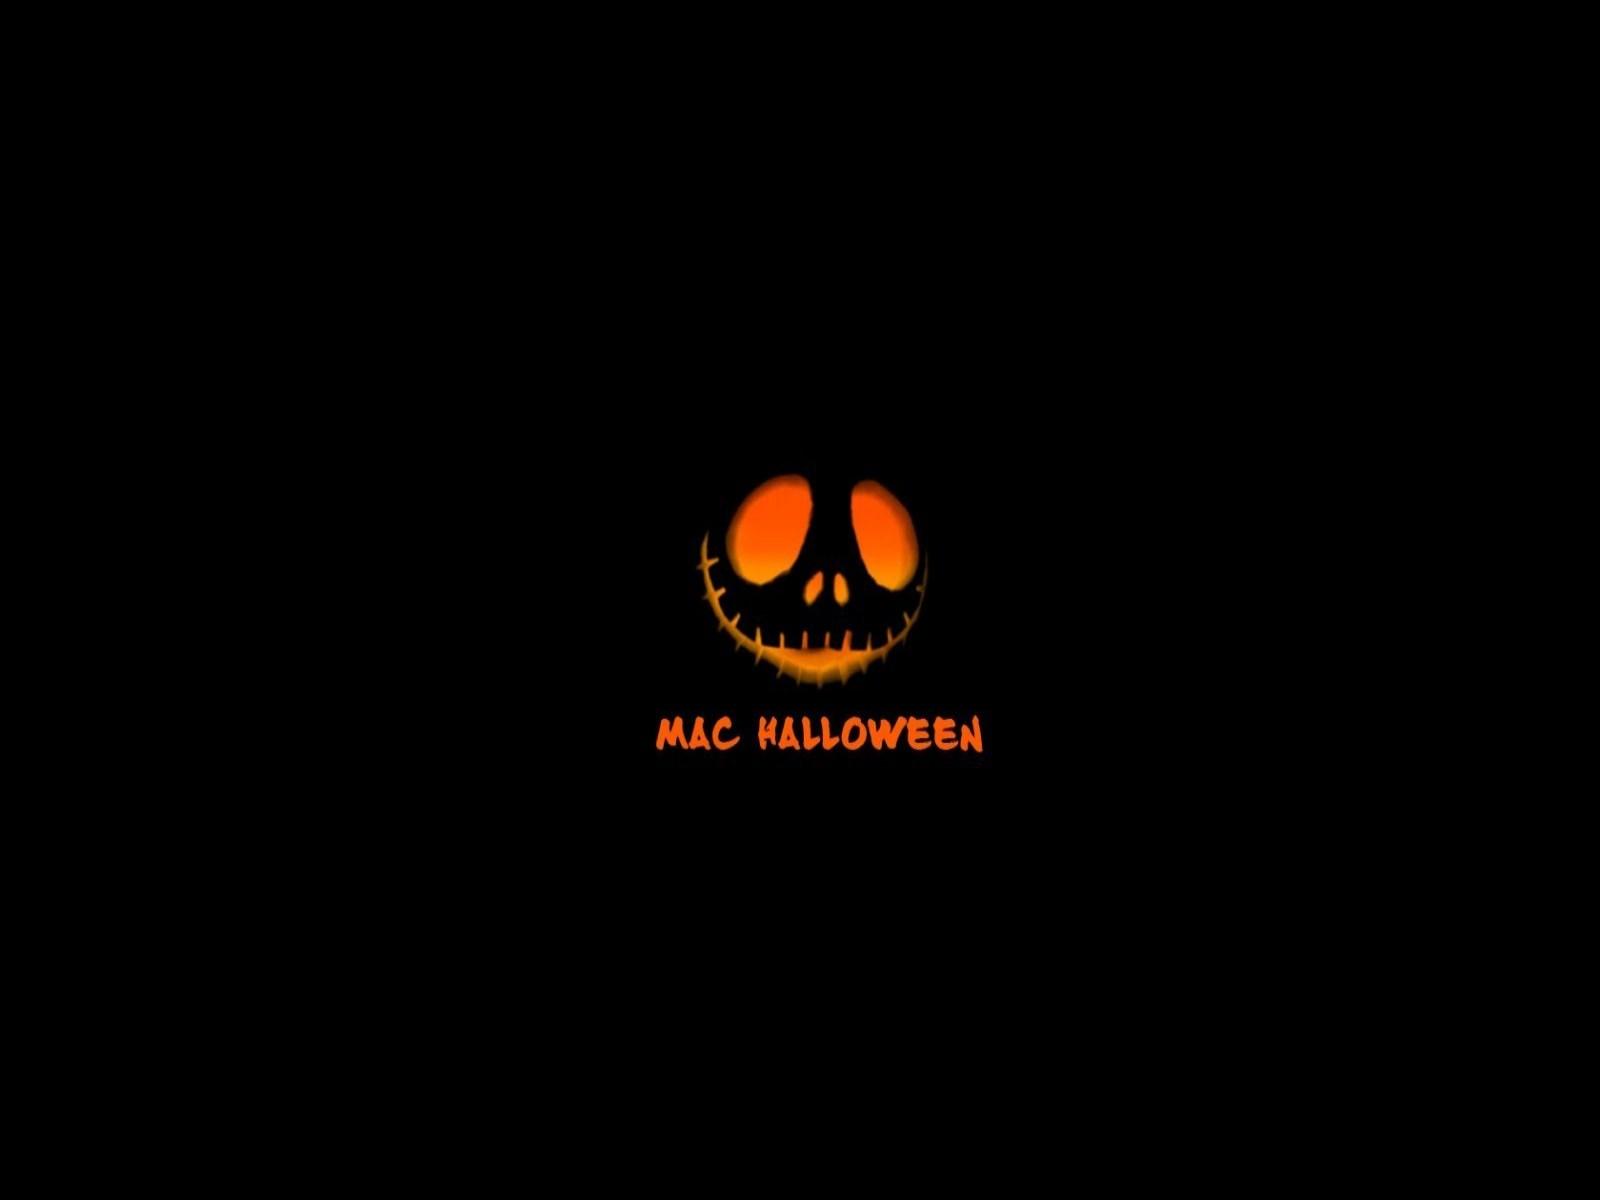 Halloween Wallpaper Mac